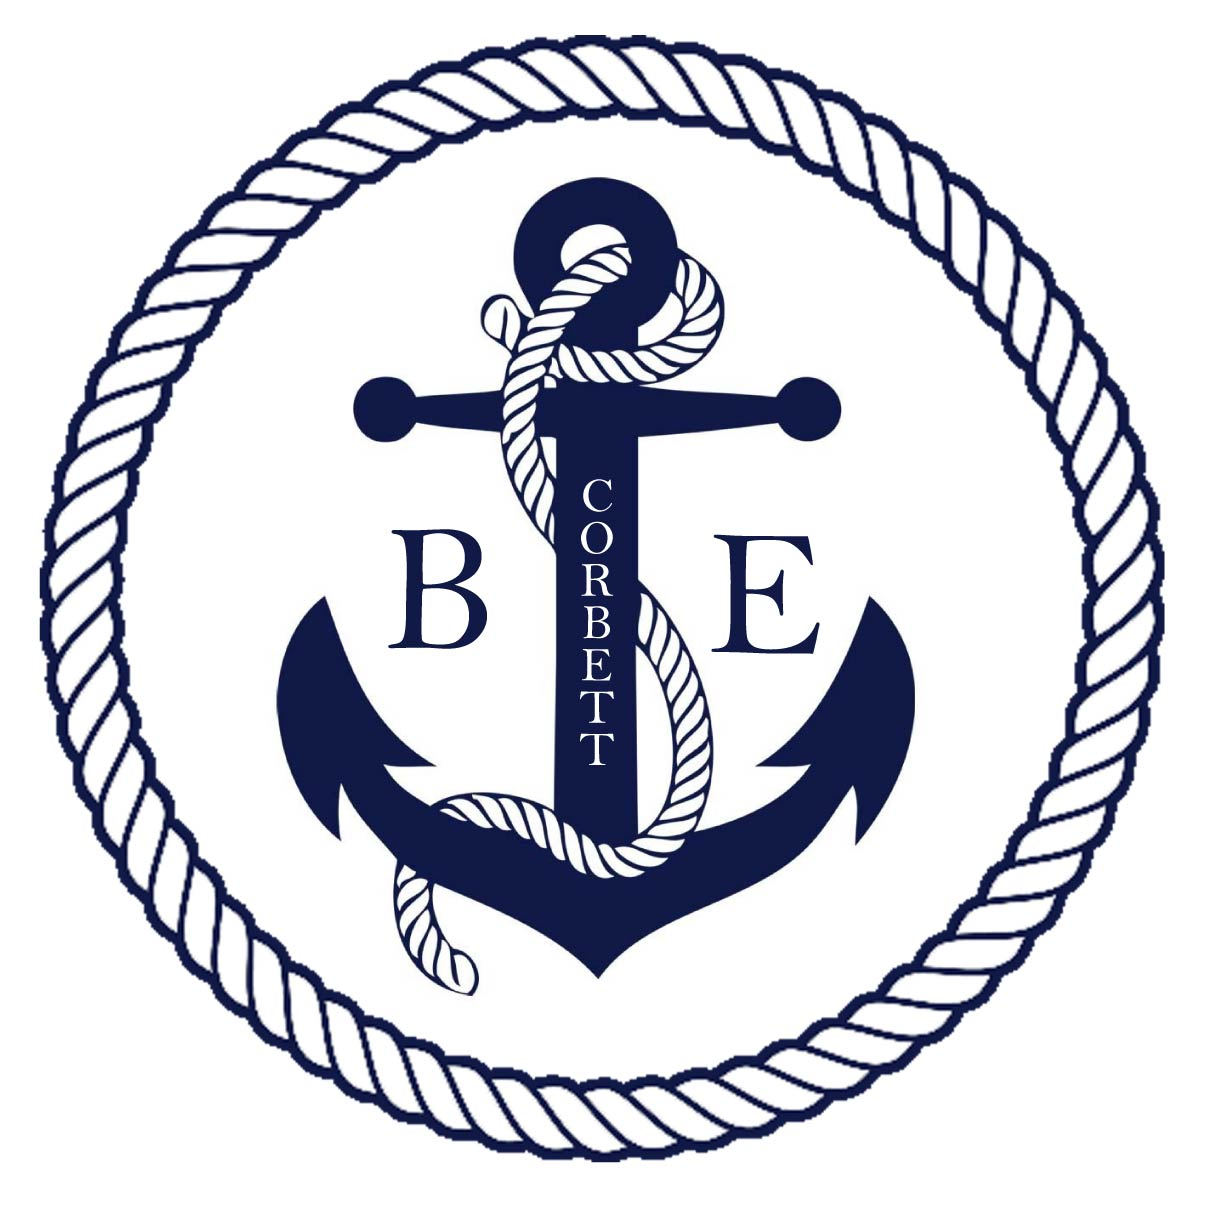 Corbett Wedding Emblem. 2017